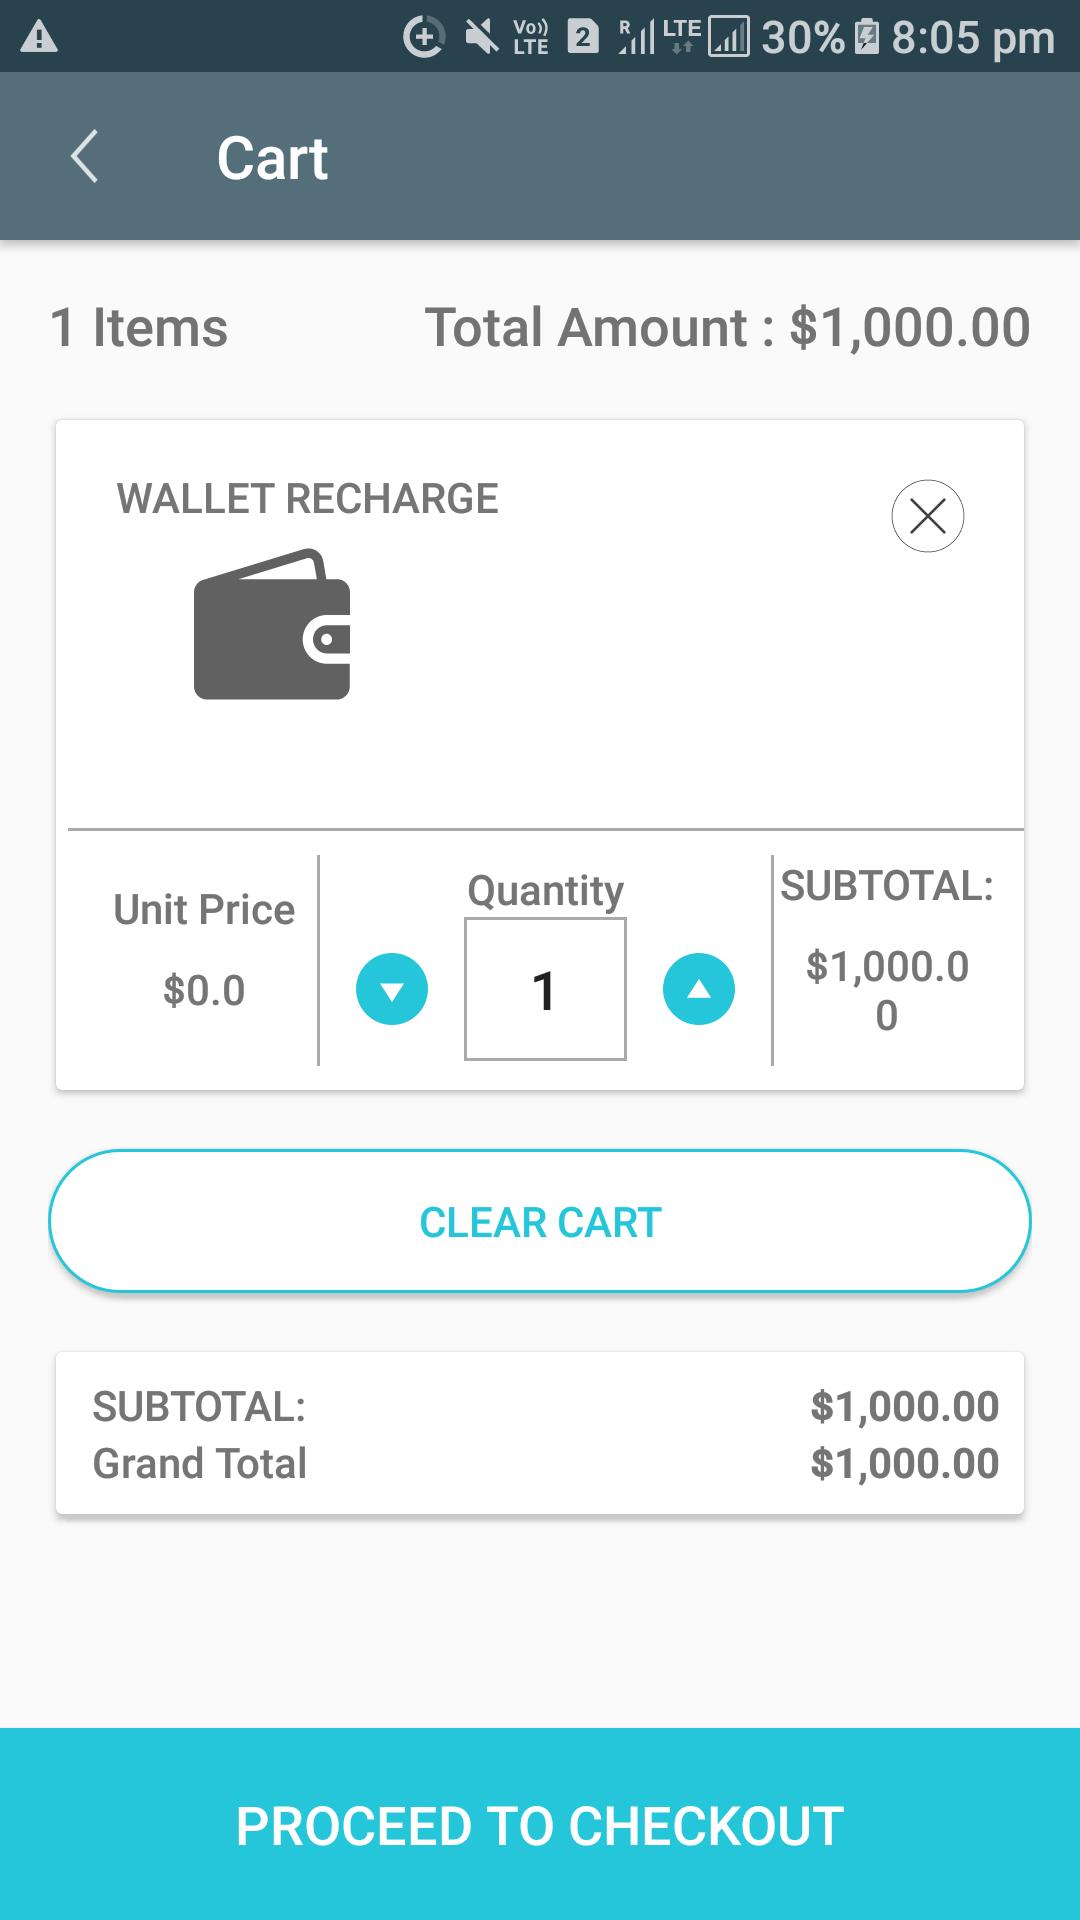 Opencart Mobikilul Wallet - Cart Details Visible